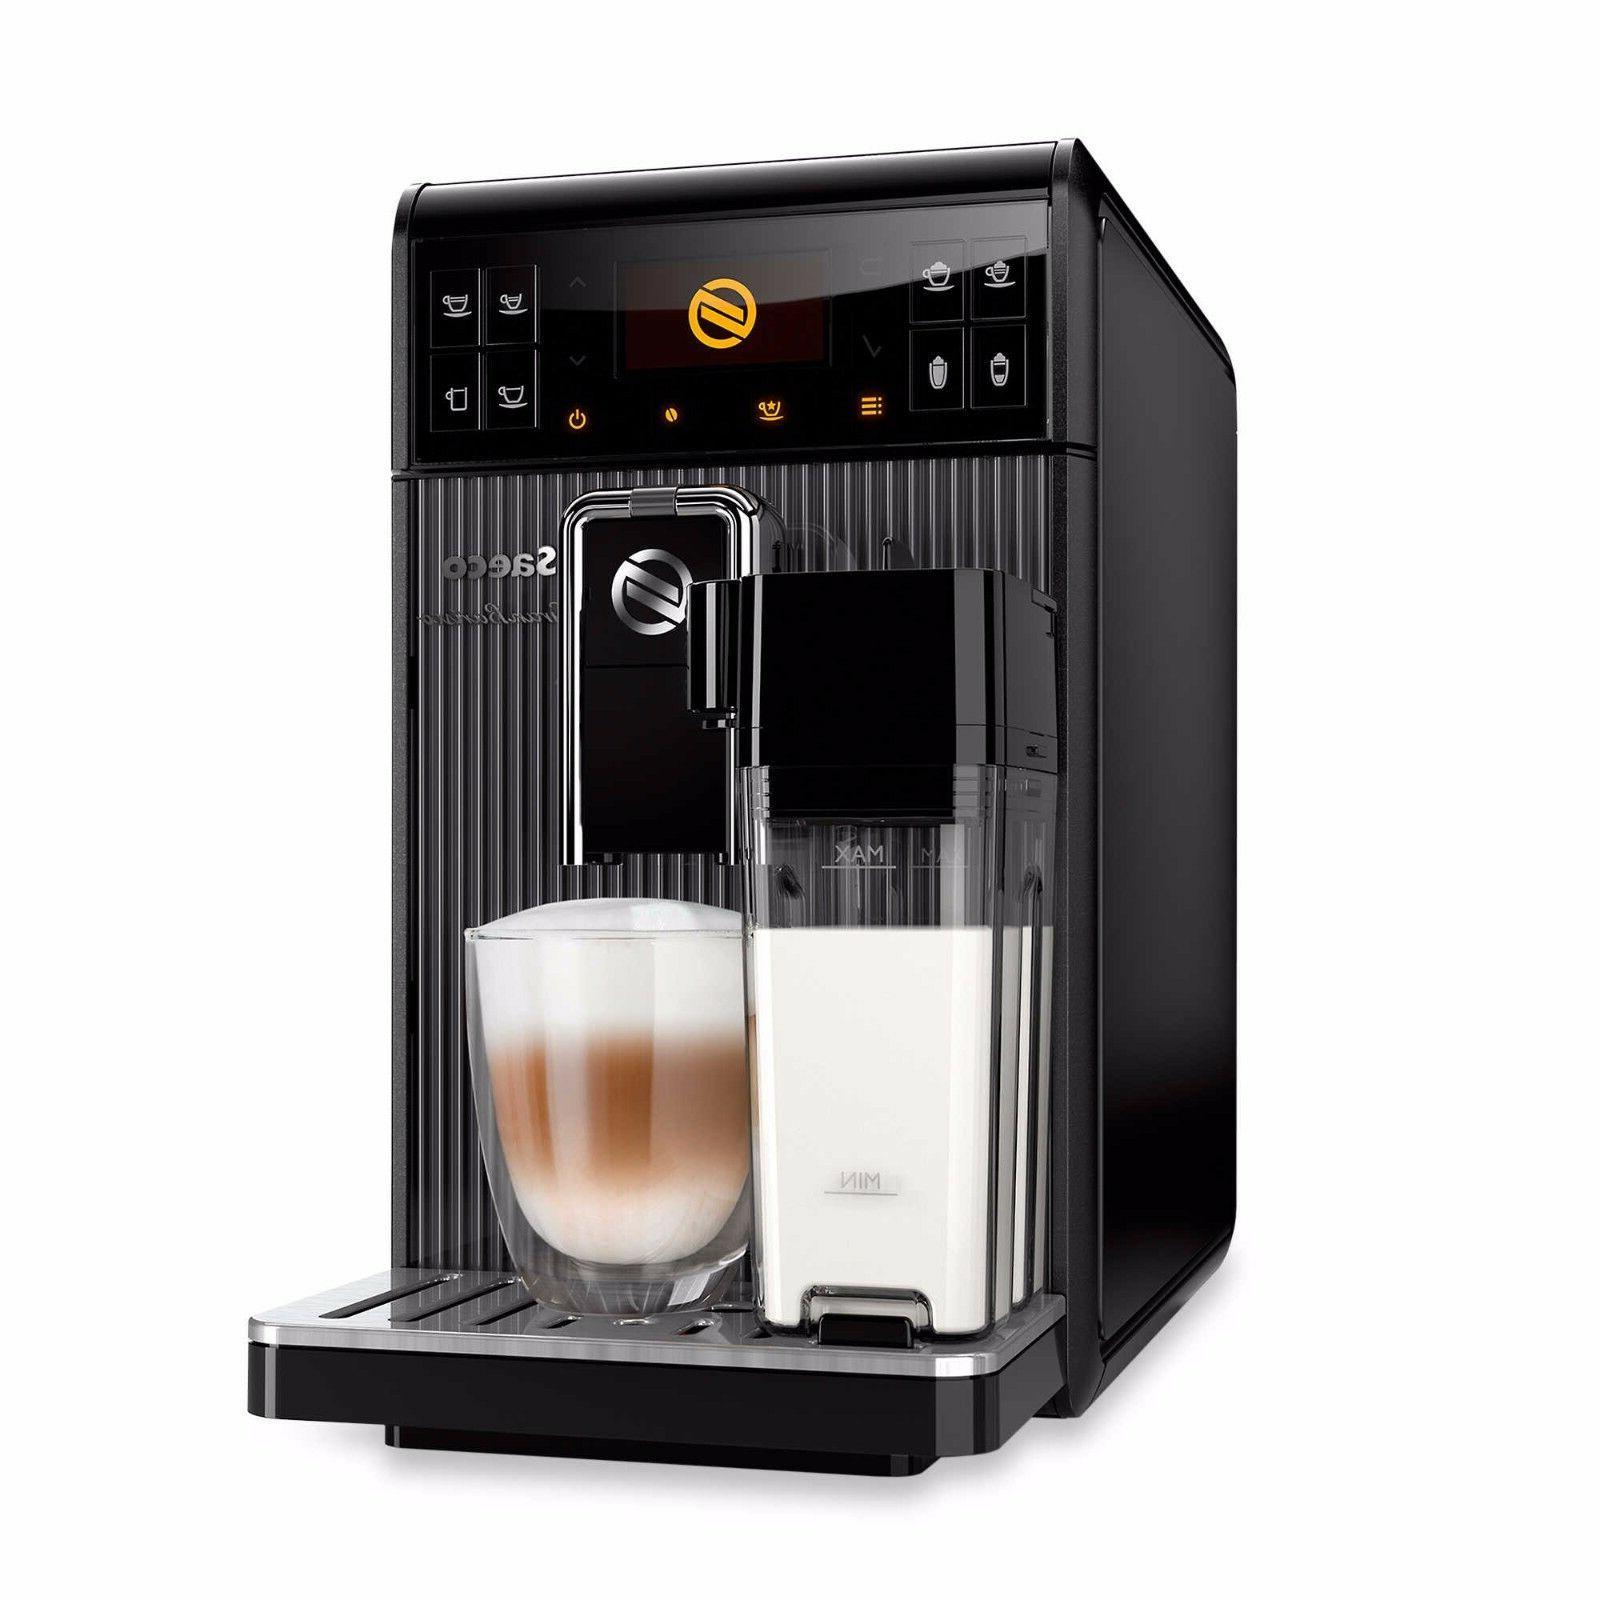 electric coffee brewer machine espresso maker built